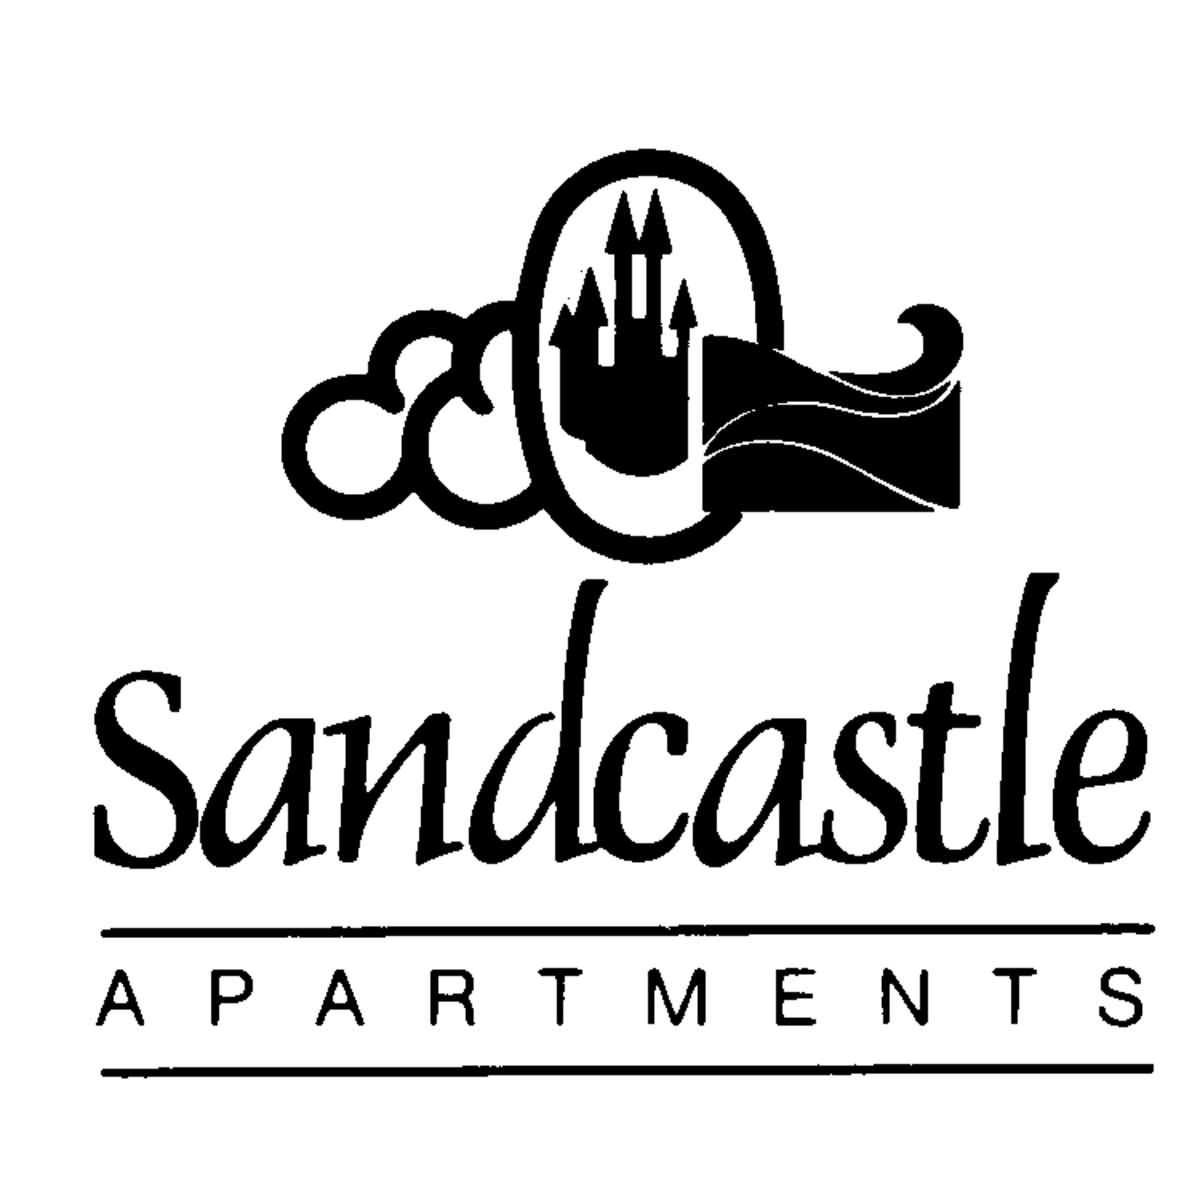 Sandcastle Apartments: Amenities At Sandcastle Apartments